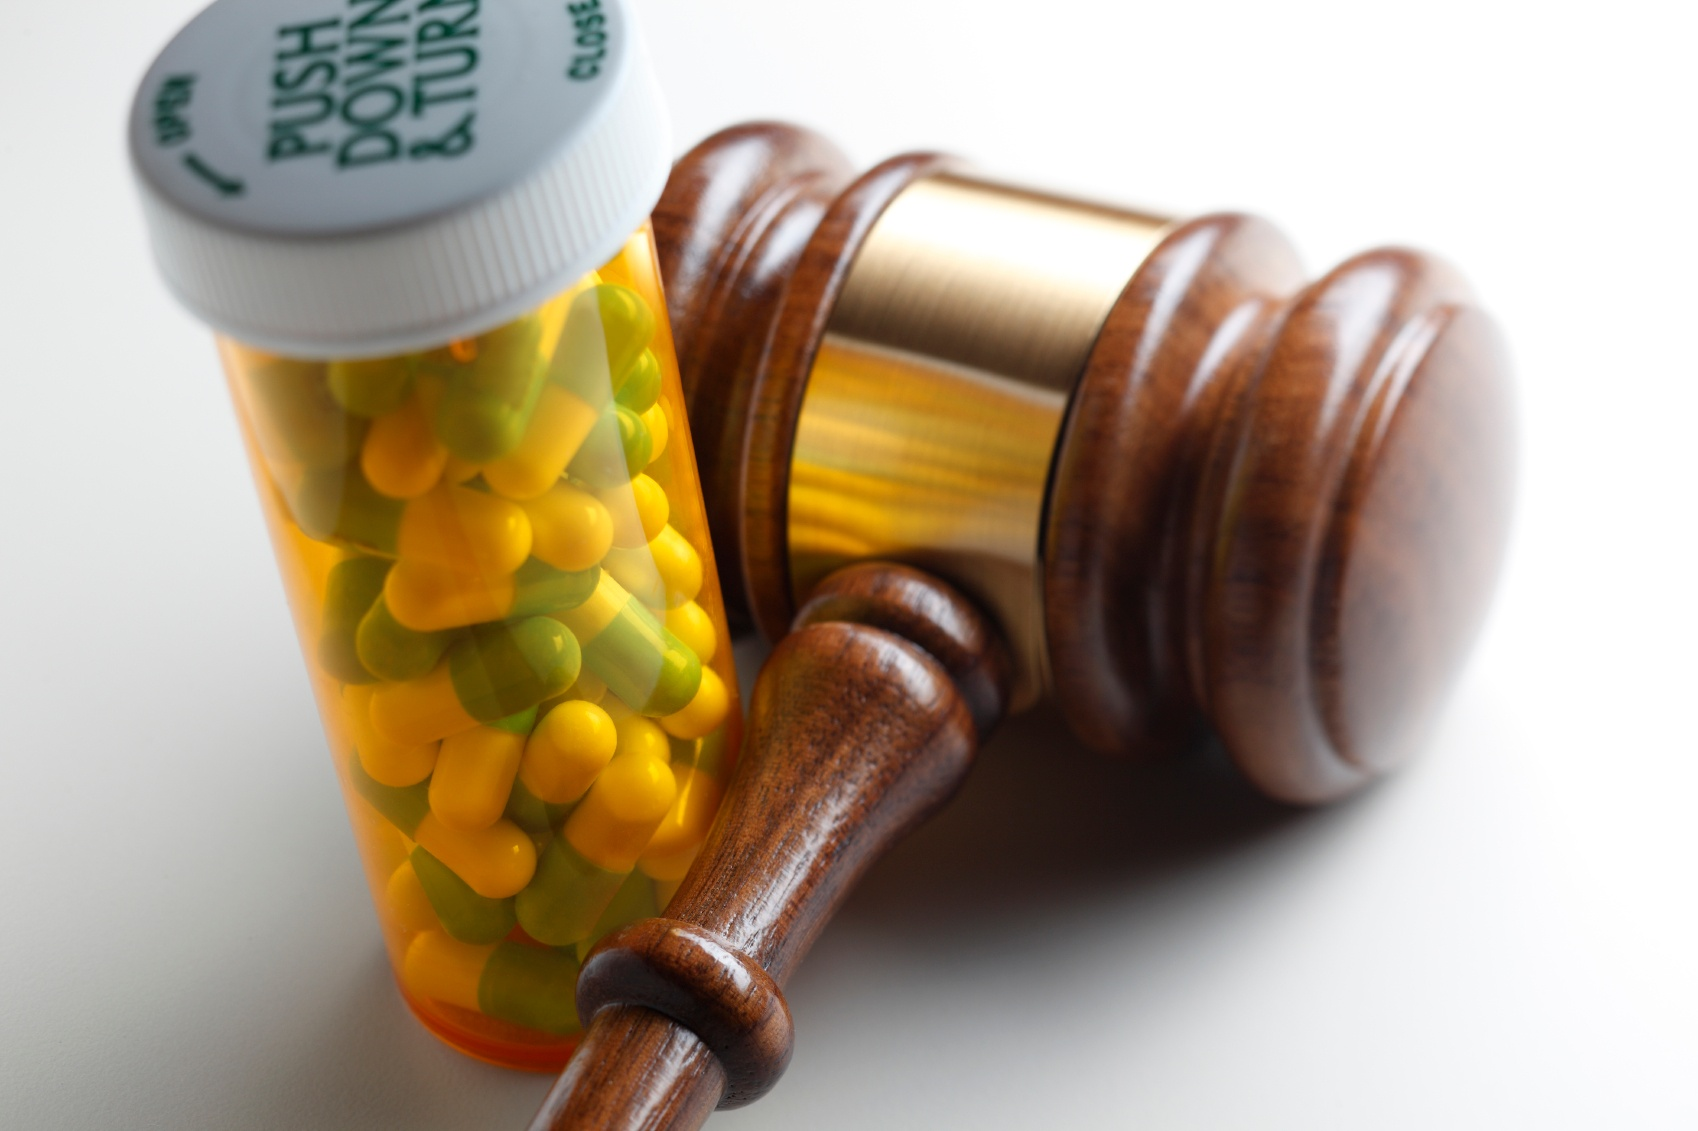 Pharmaceutical Companies Suppress Evidence and Promote PrescriptionOpioids